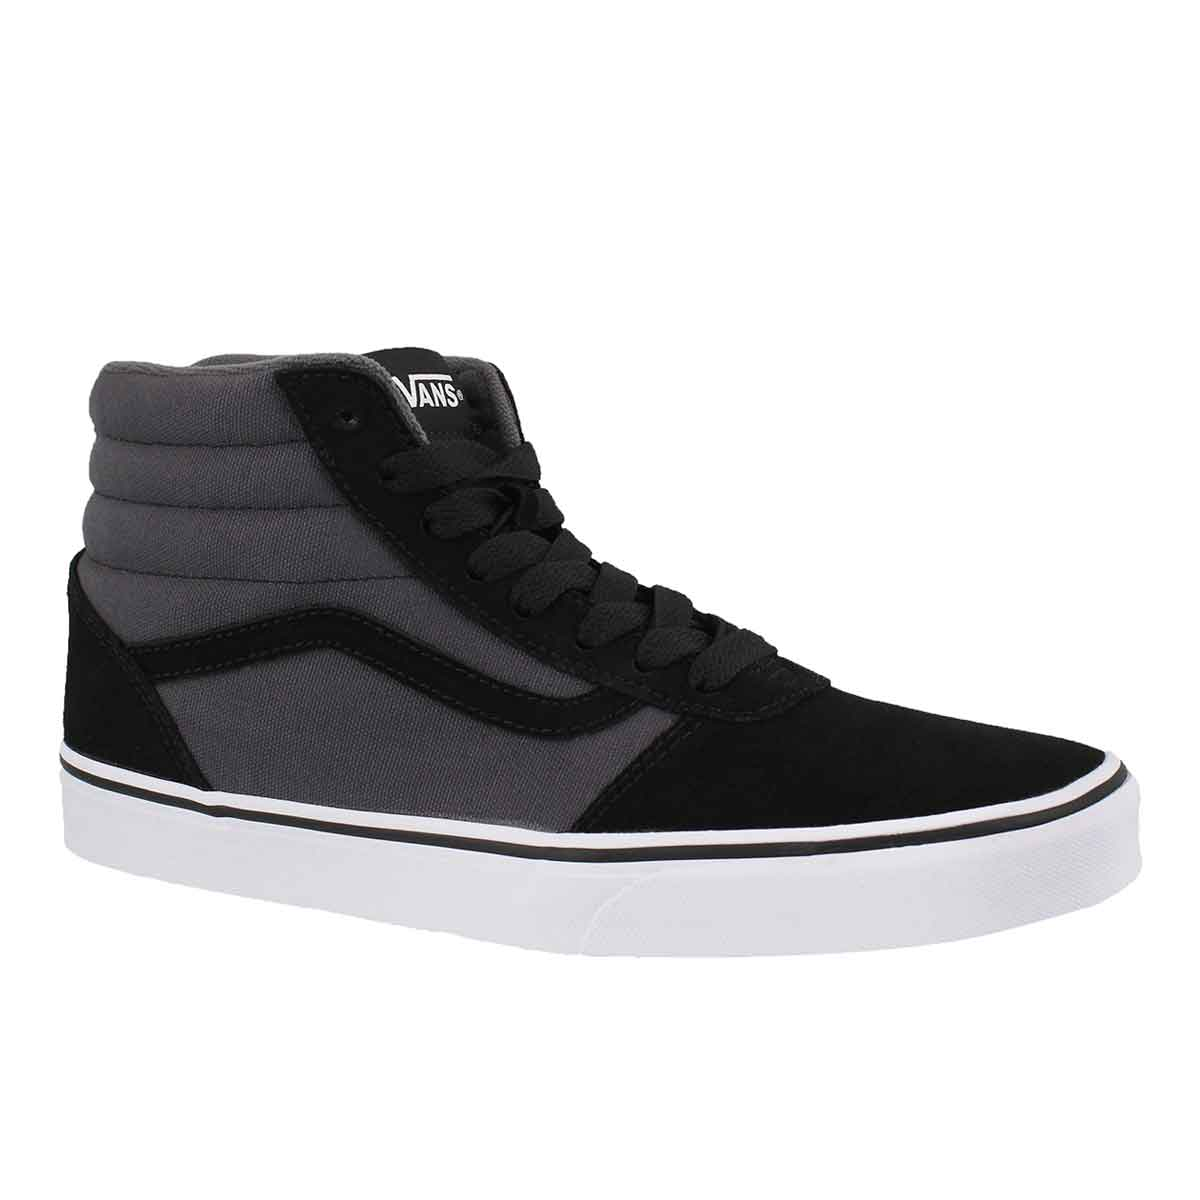 Men's WARD HI blk/asphalt lace up sneakers